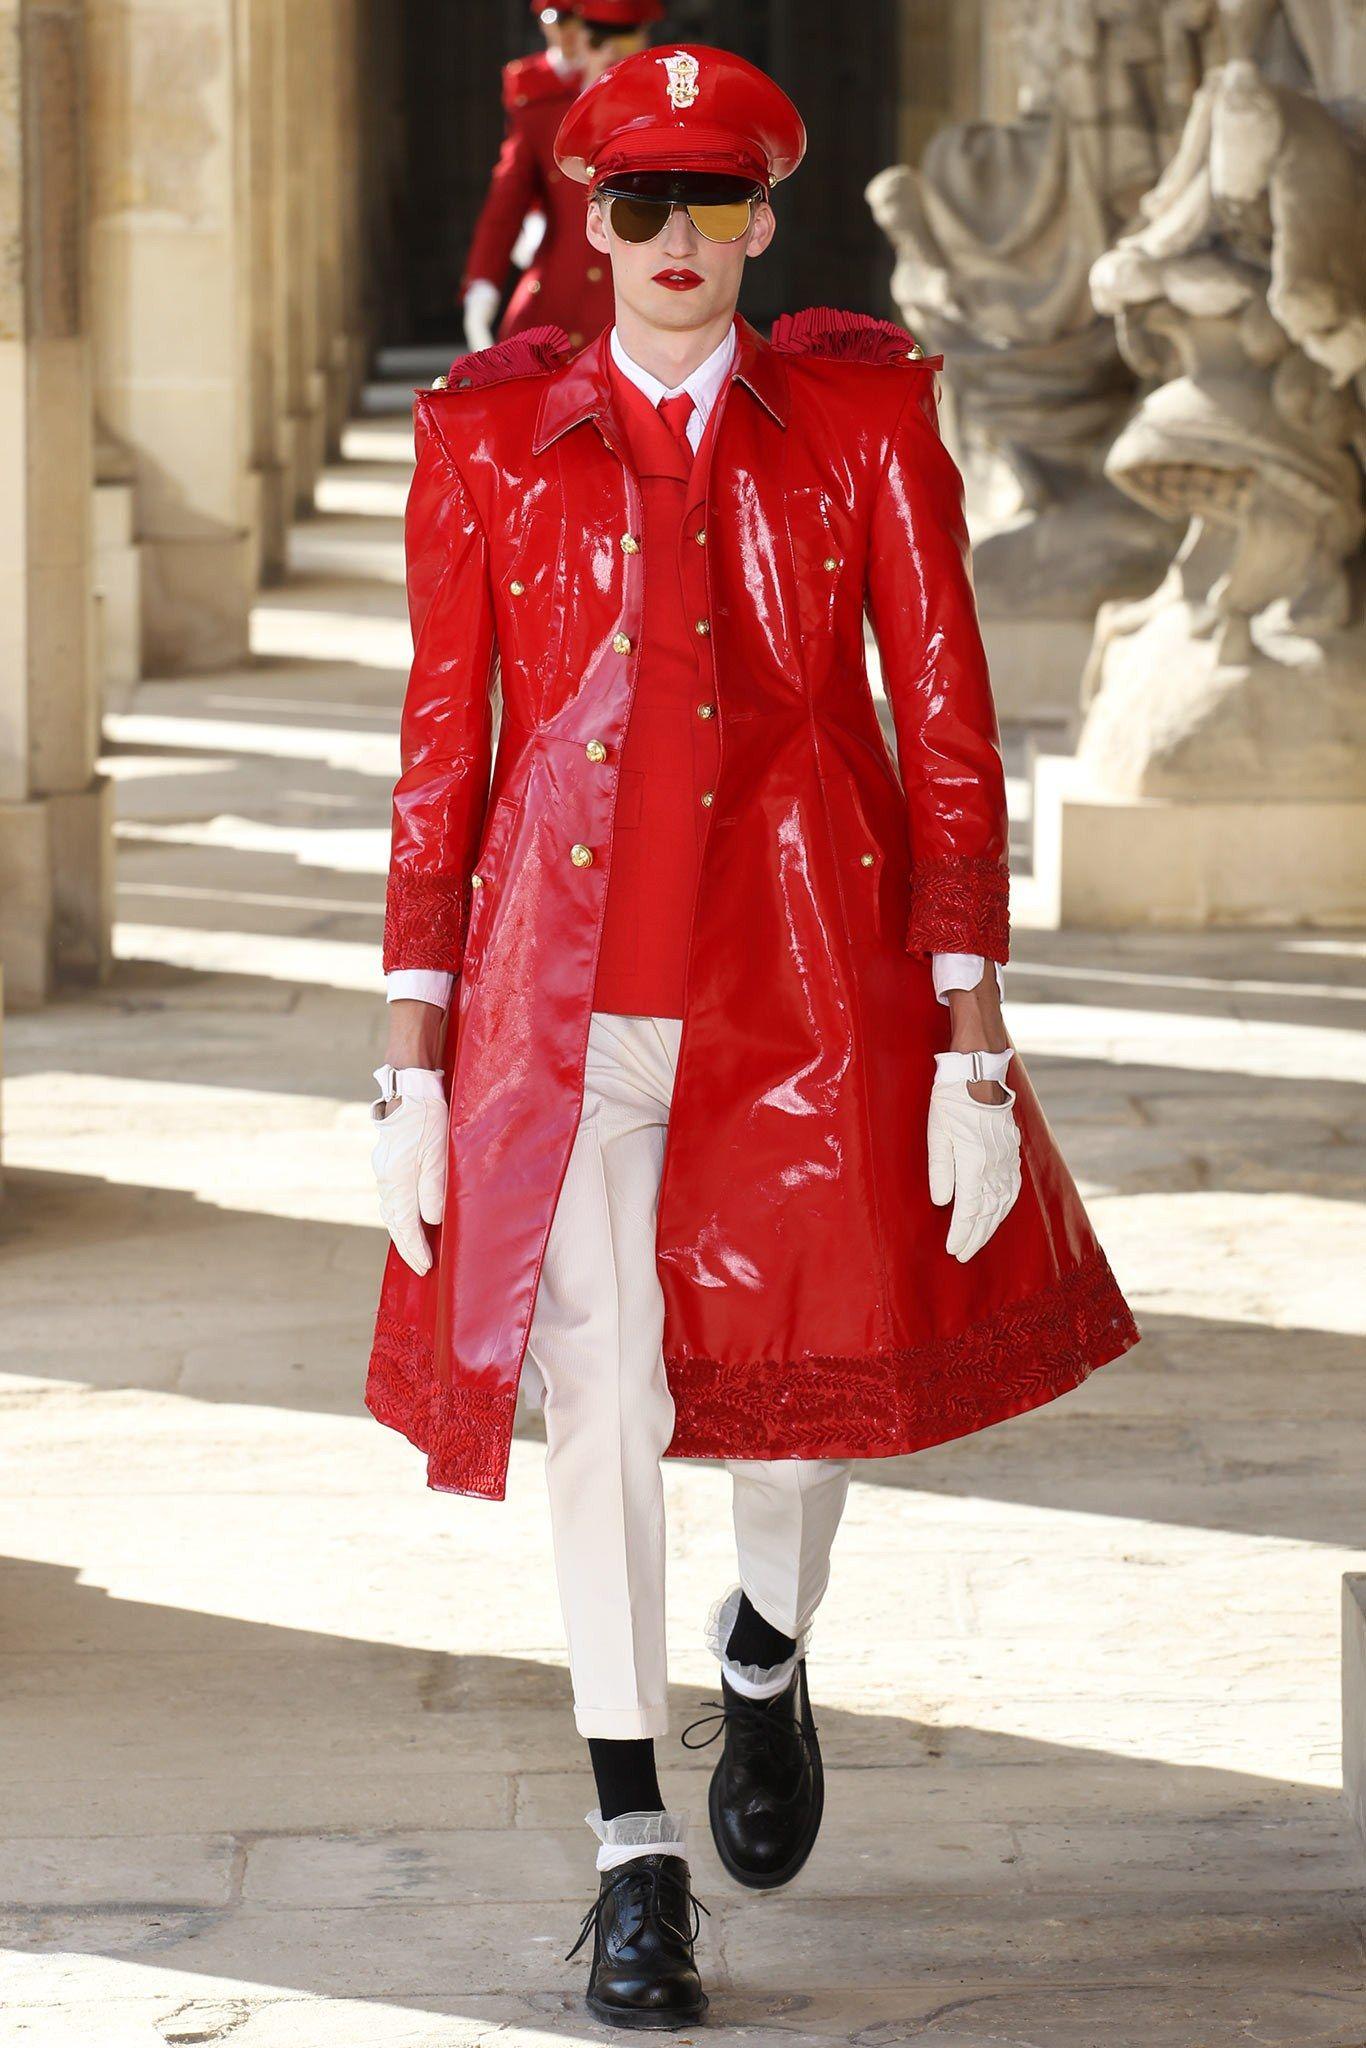 bf1c2d05d3b2 Vogue Paris in English. Thom Browne Spring 2014 Menswear